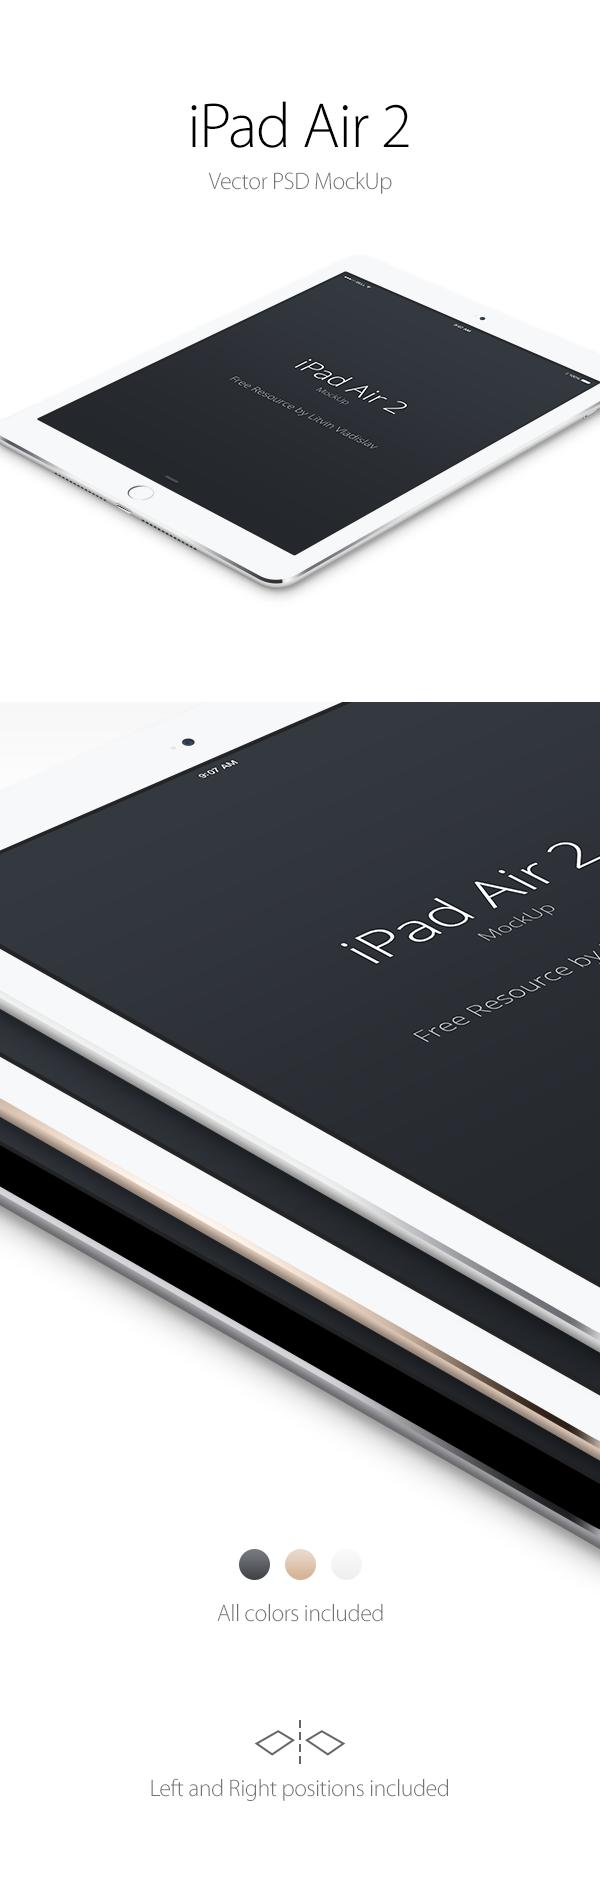 Mockup iPad Air 2